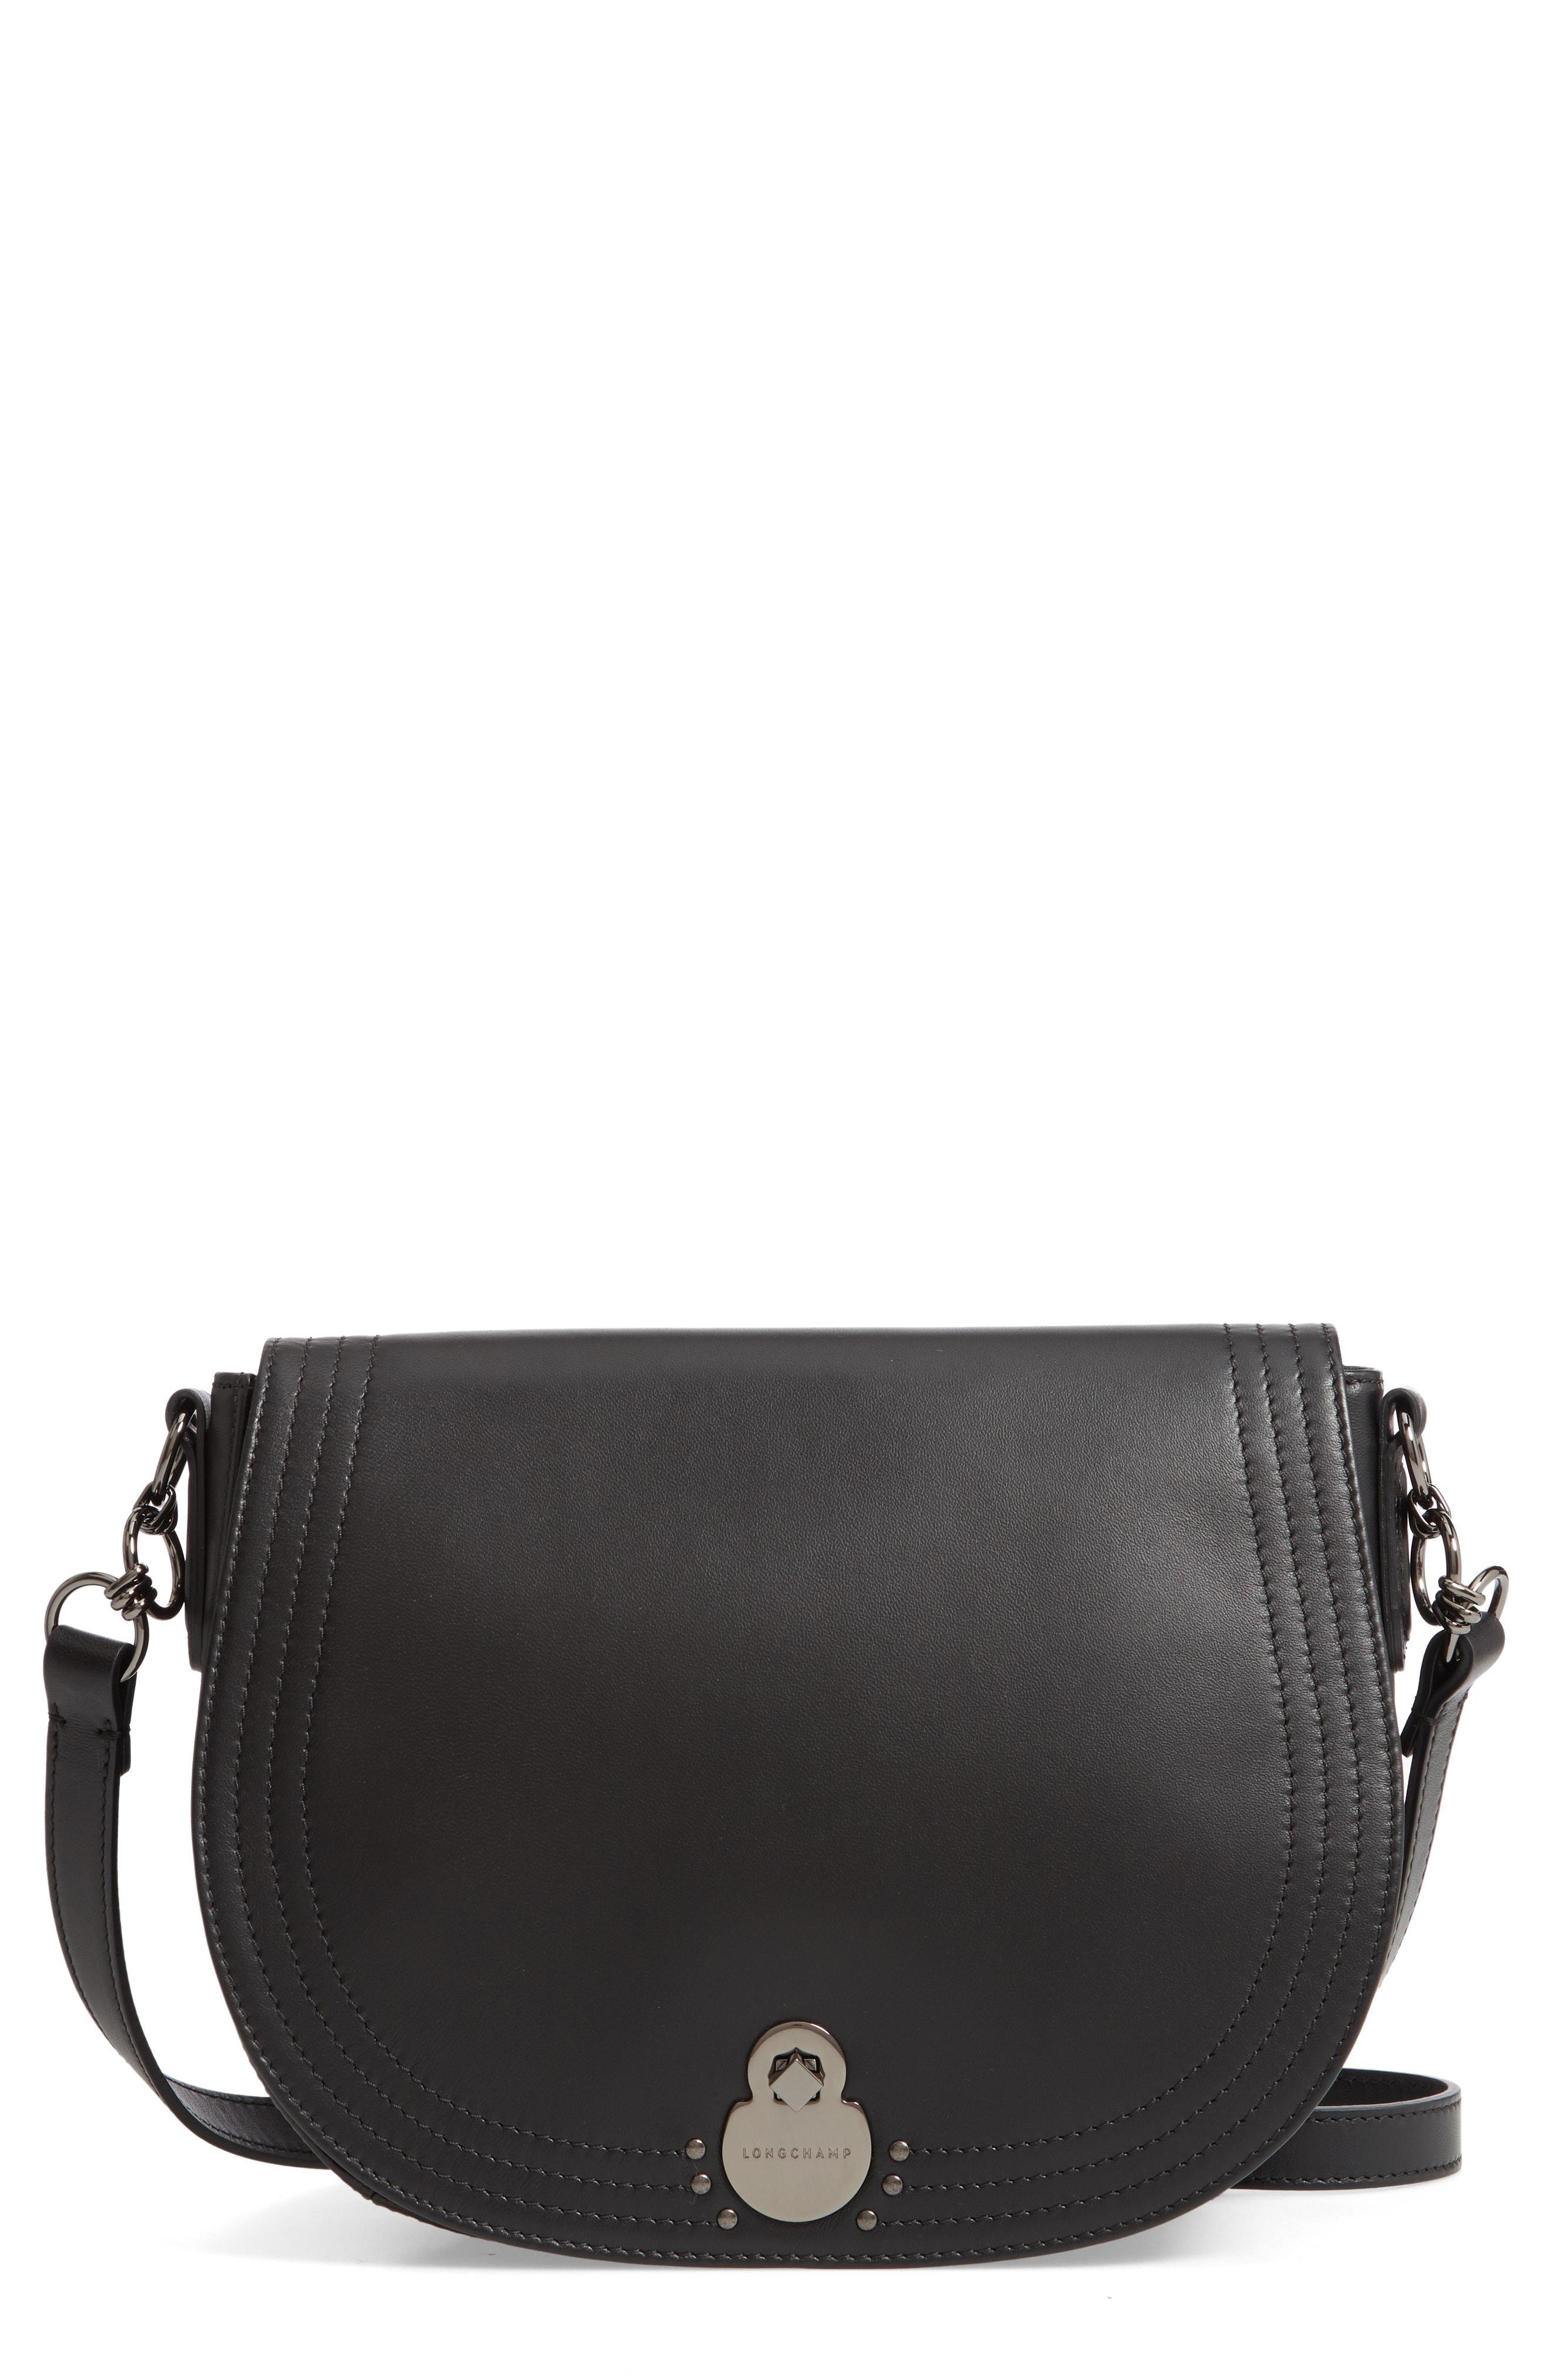 abedb1ce7511 Longchamp - Black Medium Cavalcade Leather Saddle Bag - - Lyst. View  fullscreen